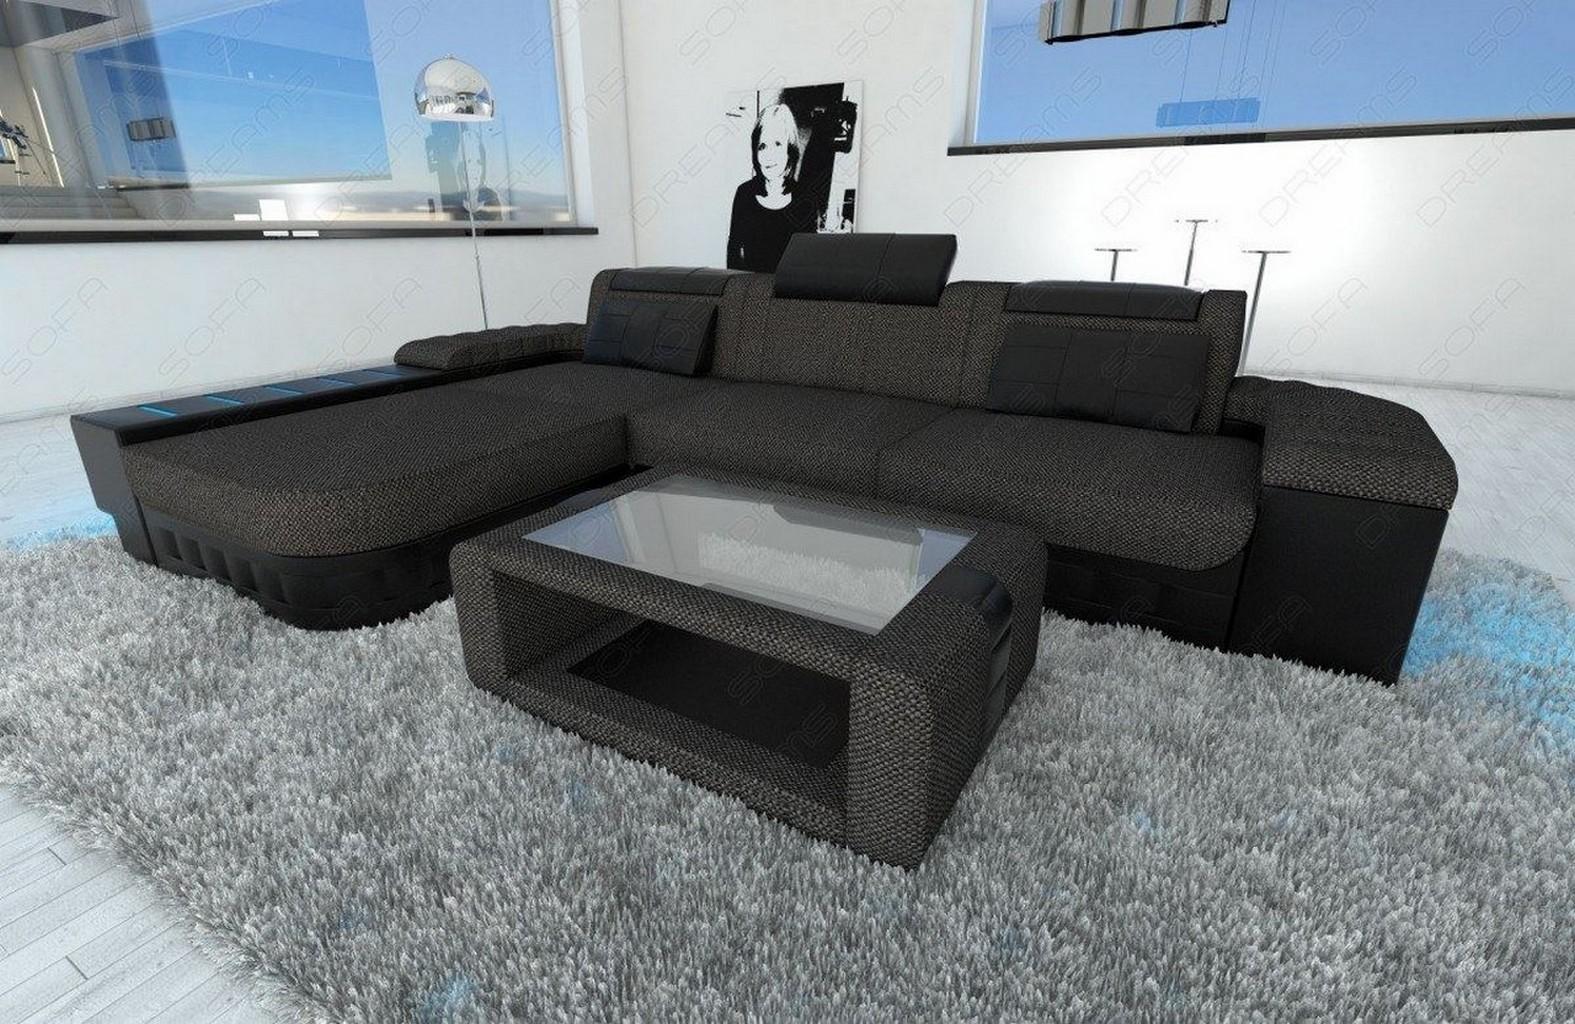 sofa materialmix bellagio l form grau led beleuchtung halb stoff halb leder ebay. Black Bedroom Furniture Sets. Home Design Ideas